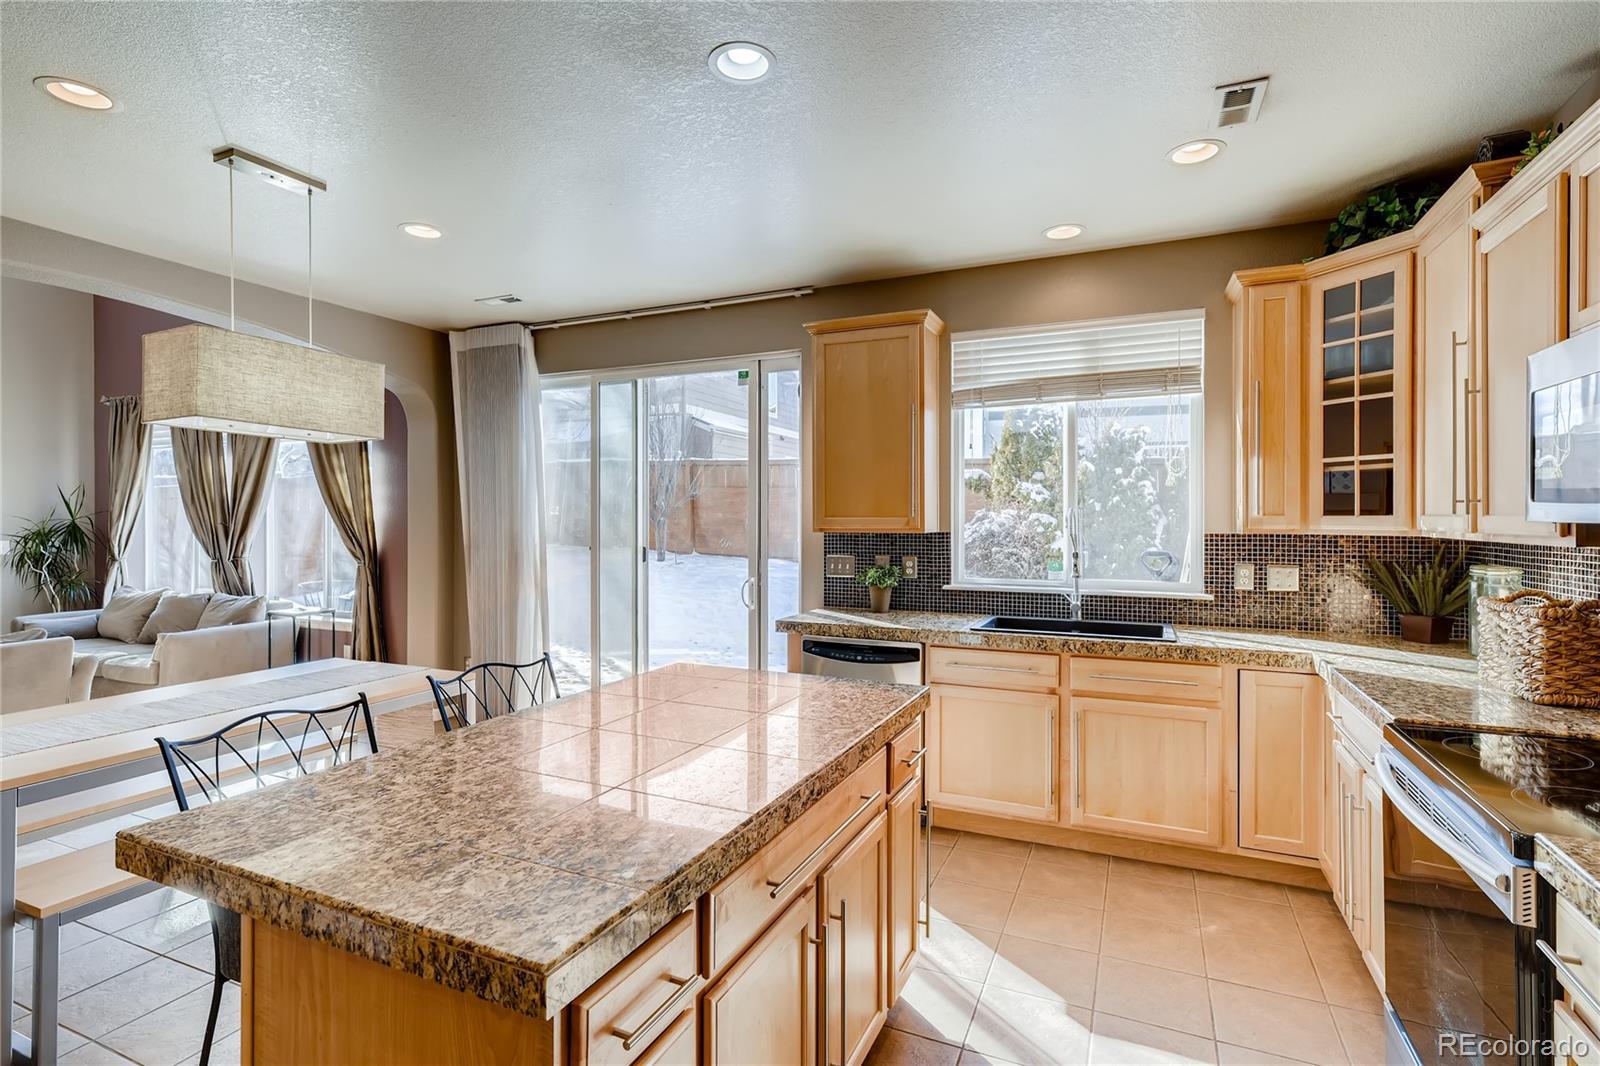 MLS# 4189939 - 1 - 4957  S Wadsworth Boulevard, Littleton, CO 80123